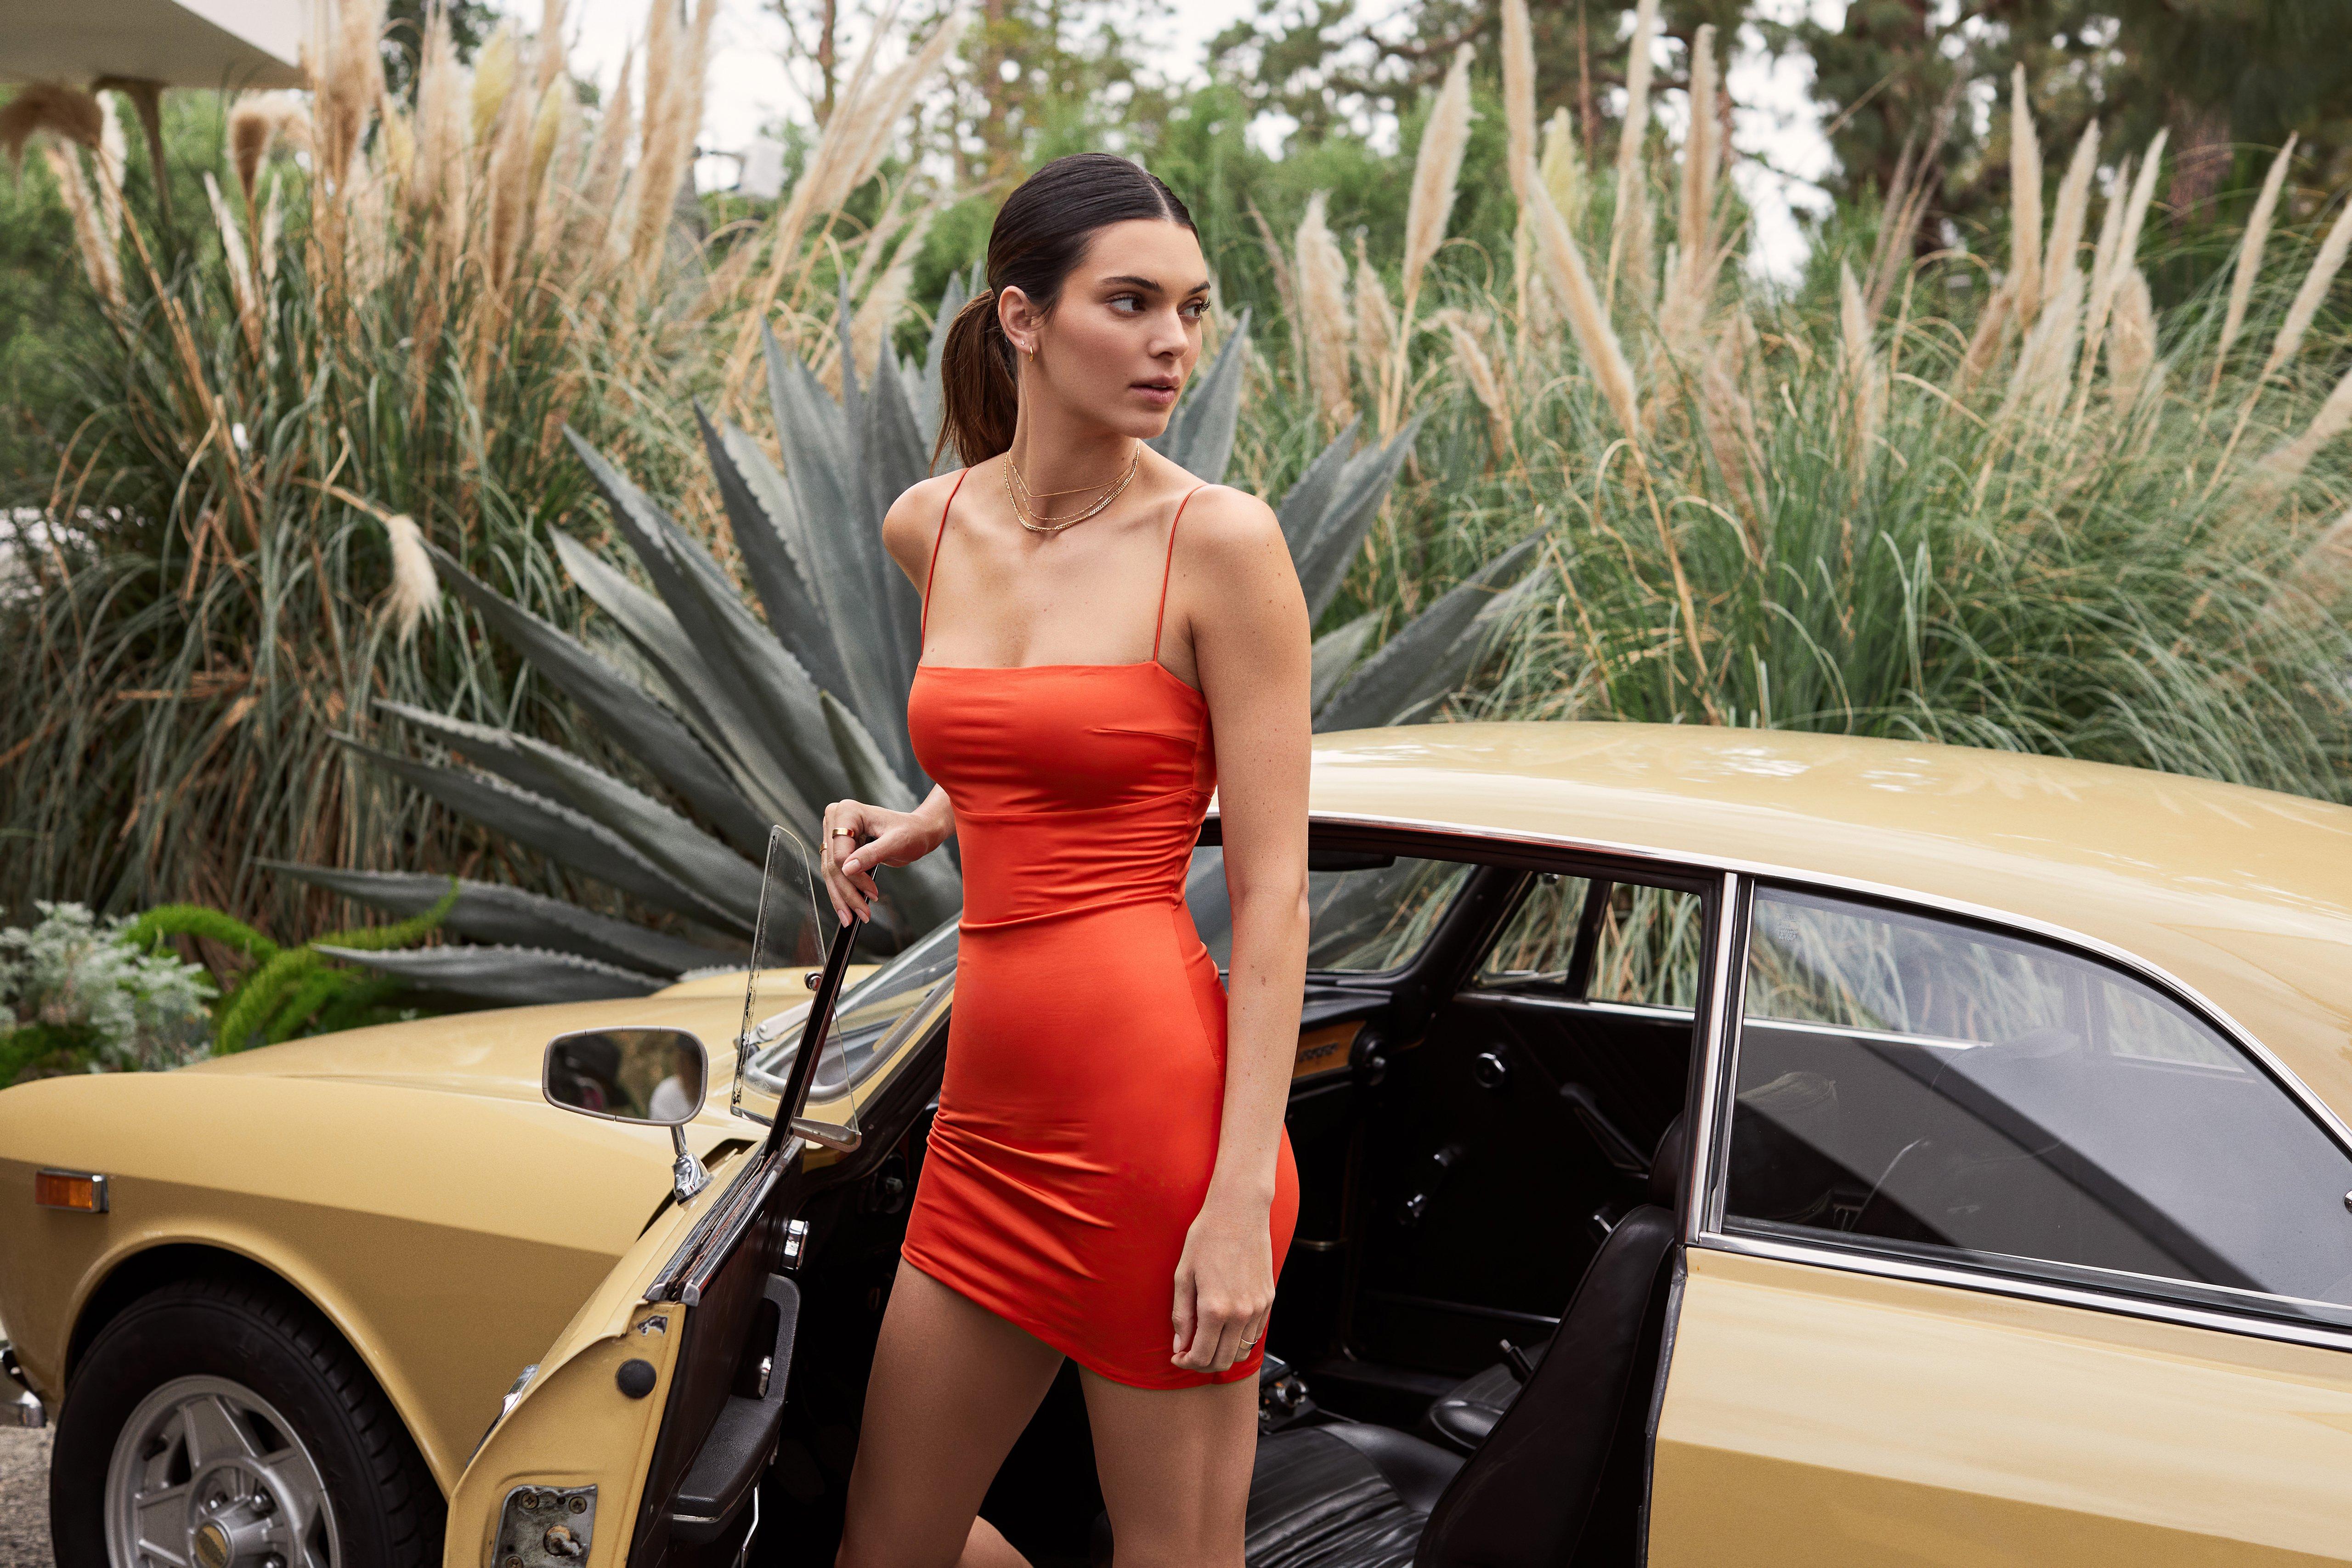 Fondos de pantalla Kendall Jenner Capsule Collection